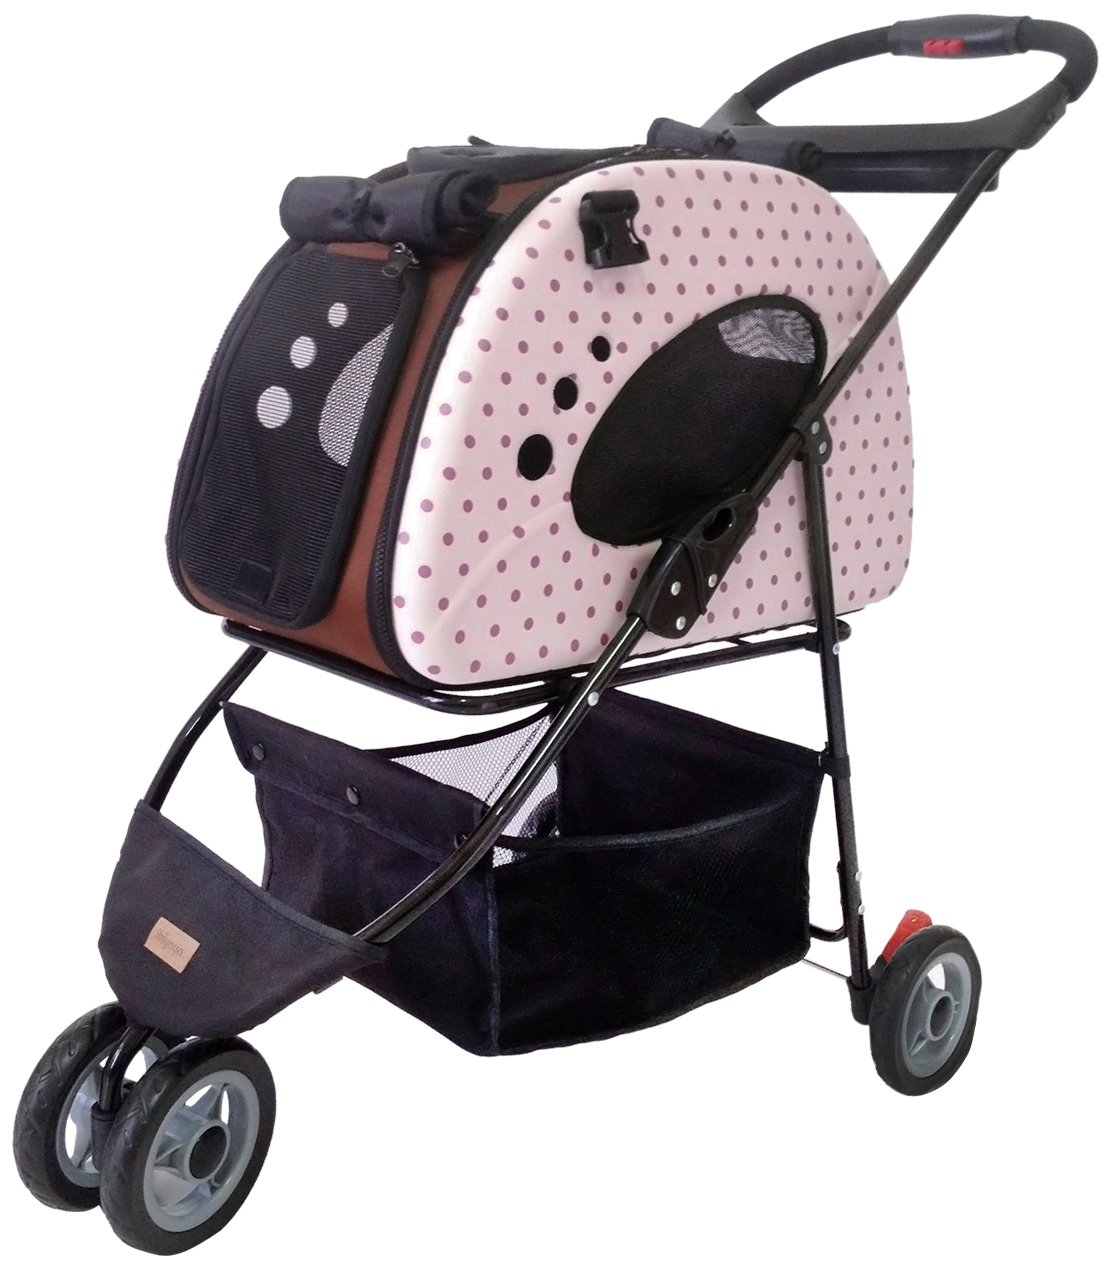 Petzip FS1211-P Mochi Carrier Stroller, Pink, Small